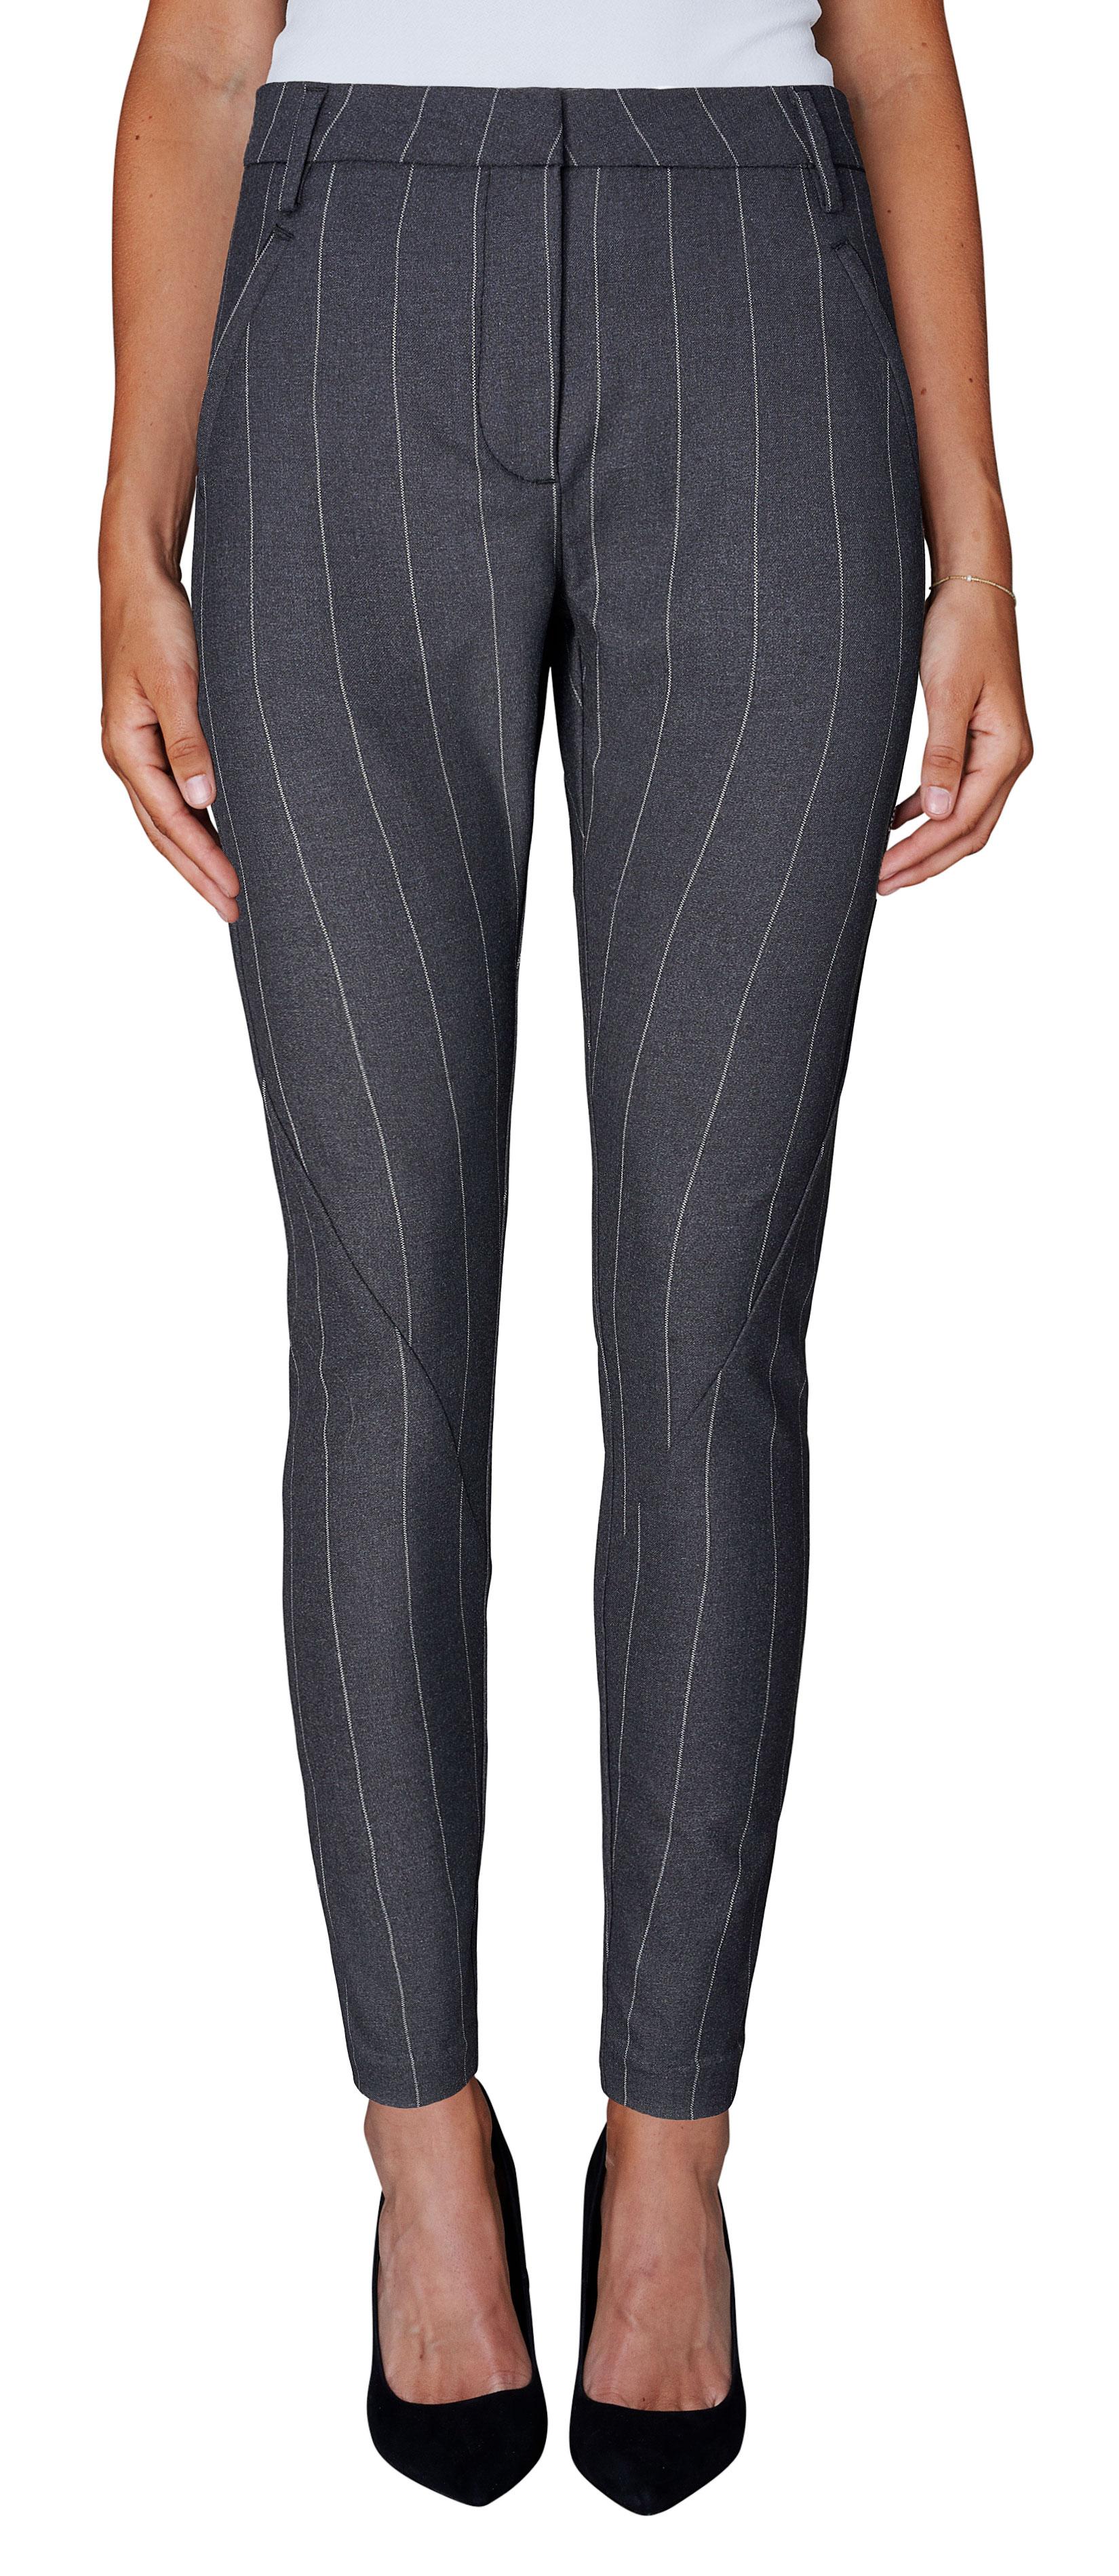 Fiveunits grå bukse, grå dressbukse fra Five Units, grå